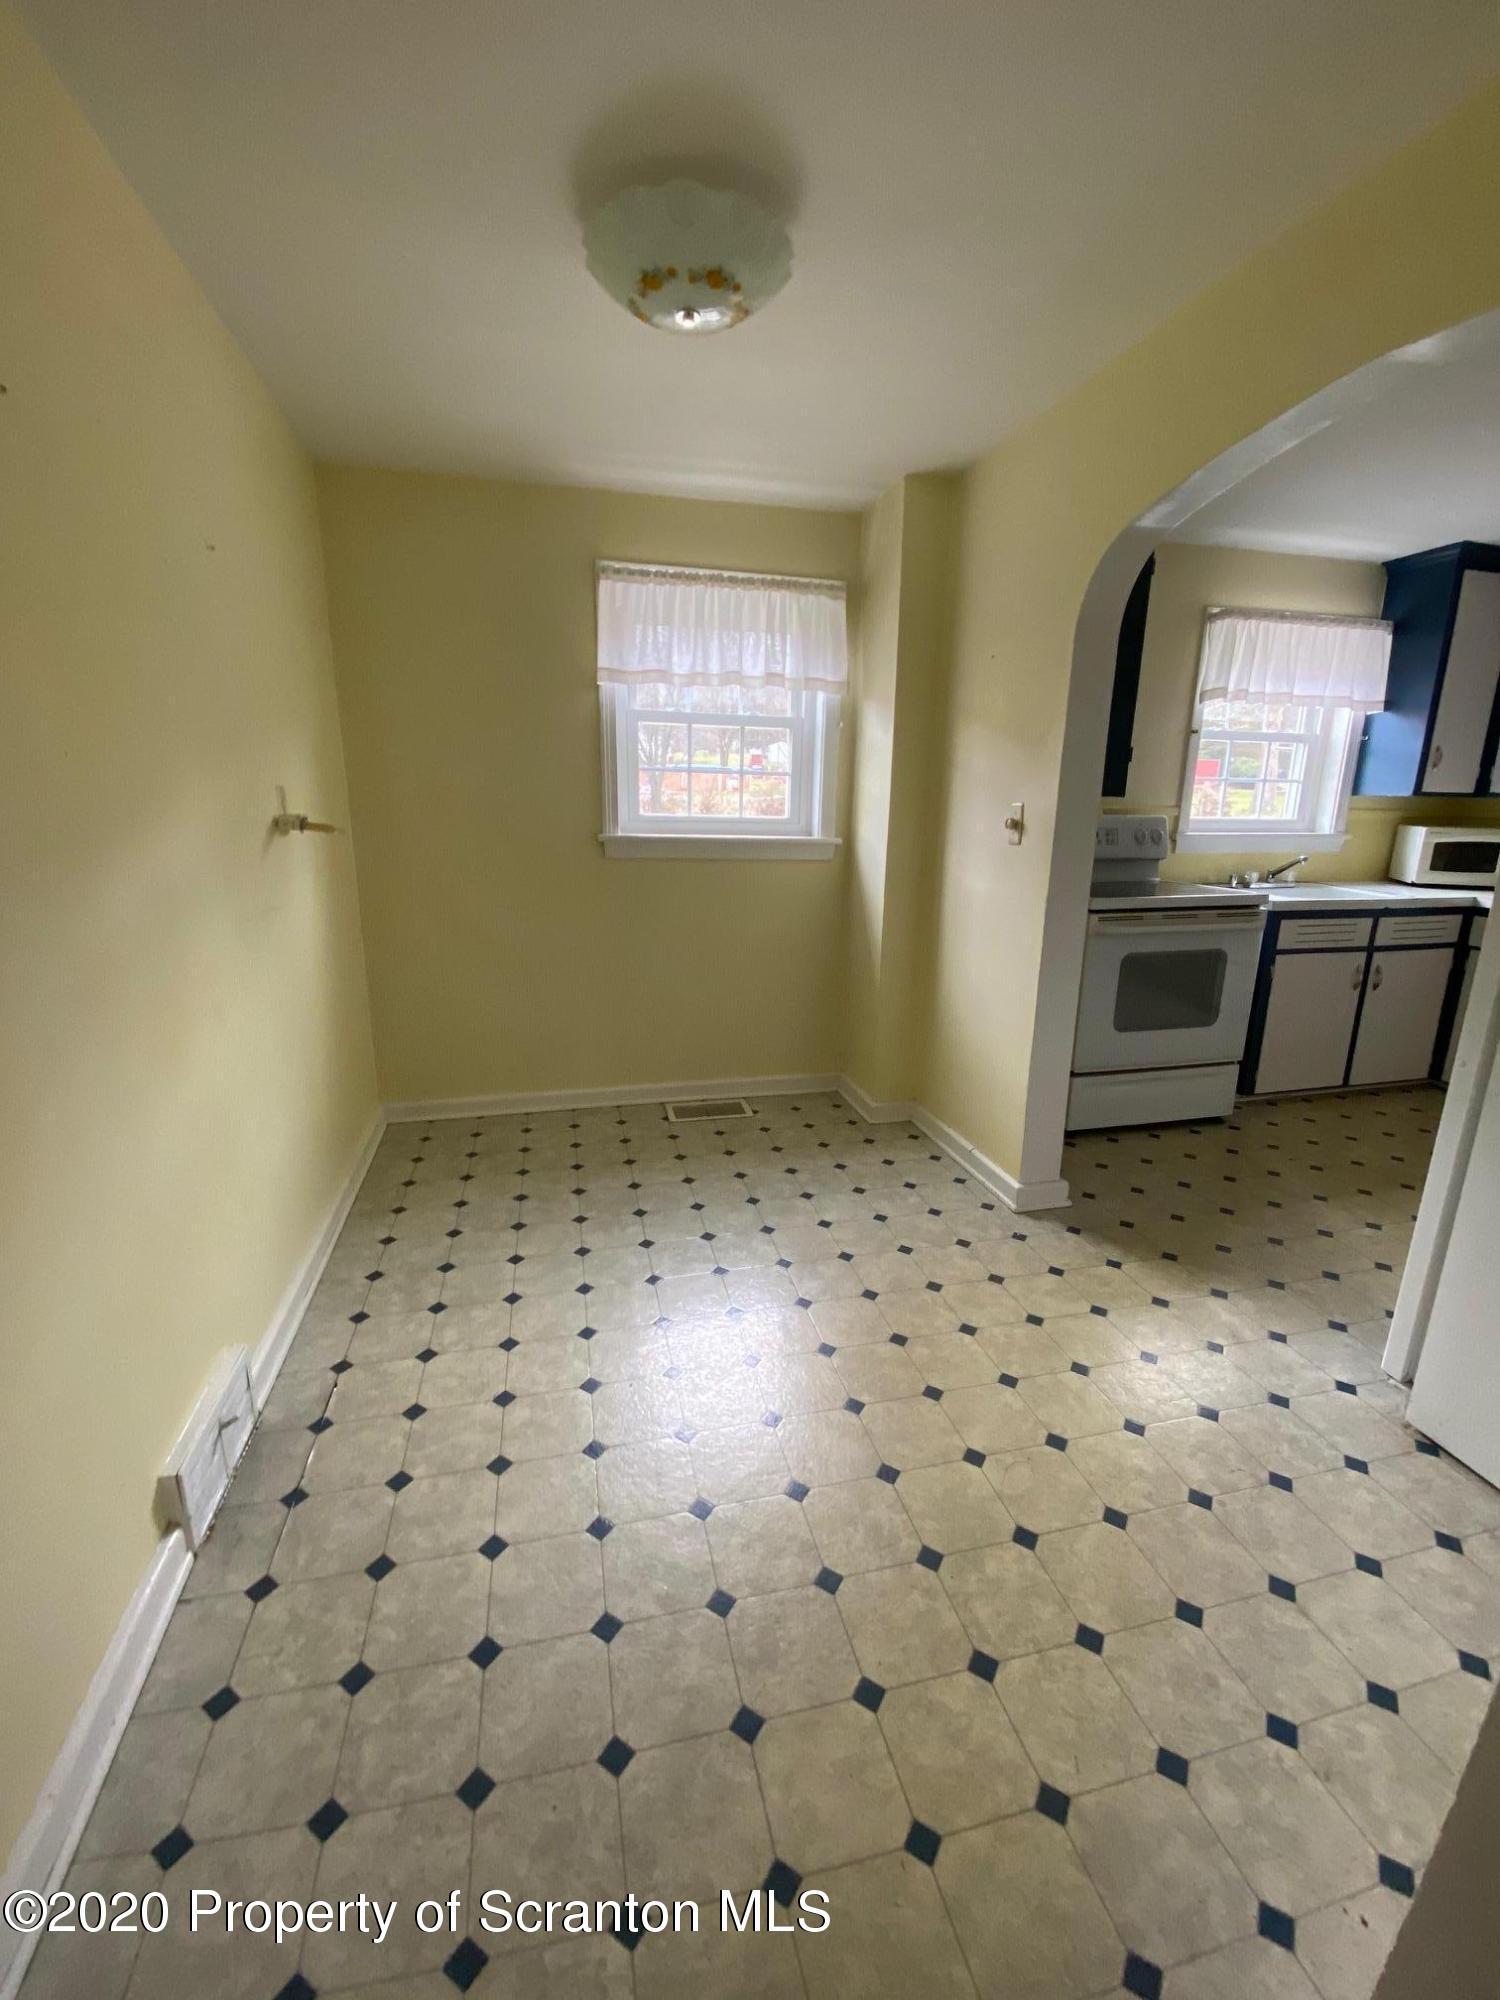 868 Justus Blvd, Scott Twp, Pennsylvania 18447, 4 Bedrooms Bedrooms, 7 Rooms Rooms,1 BathroomBathrooms,Single Family,For Sale,Justus,20-5173